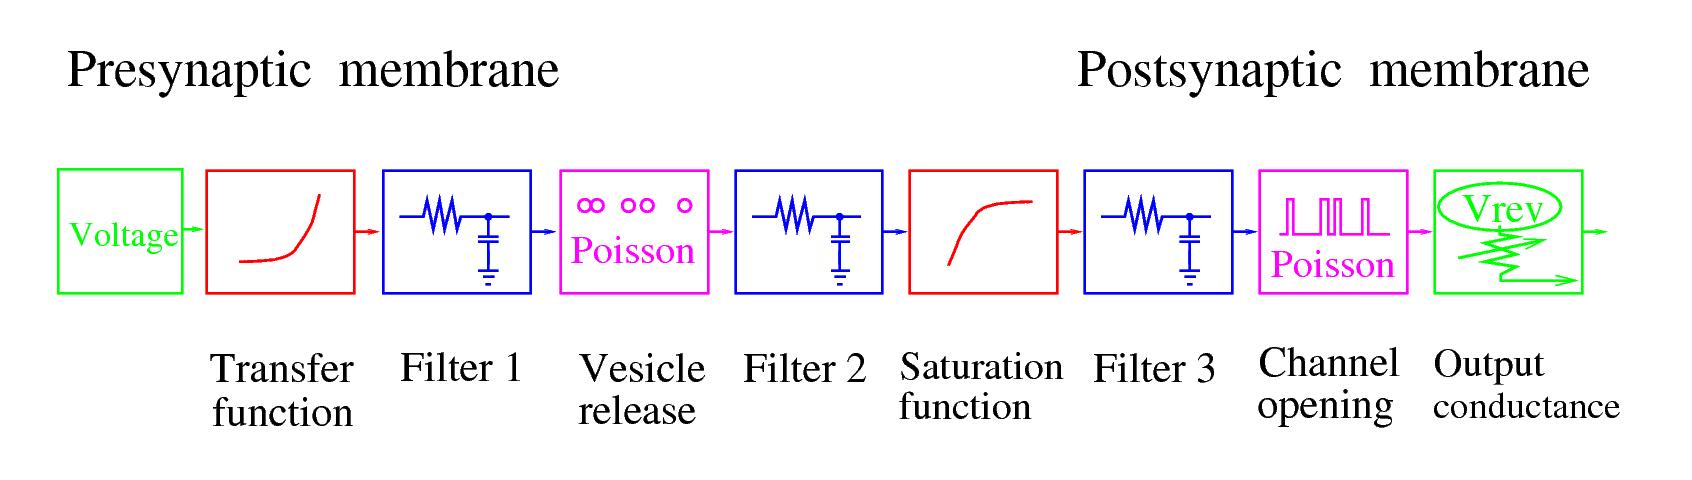 NeuronC User's Manual Part II